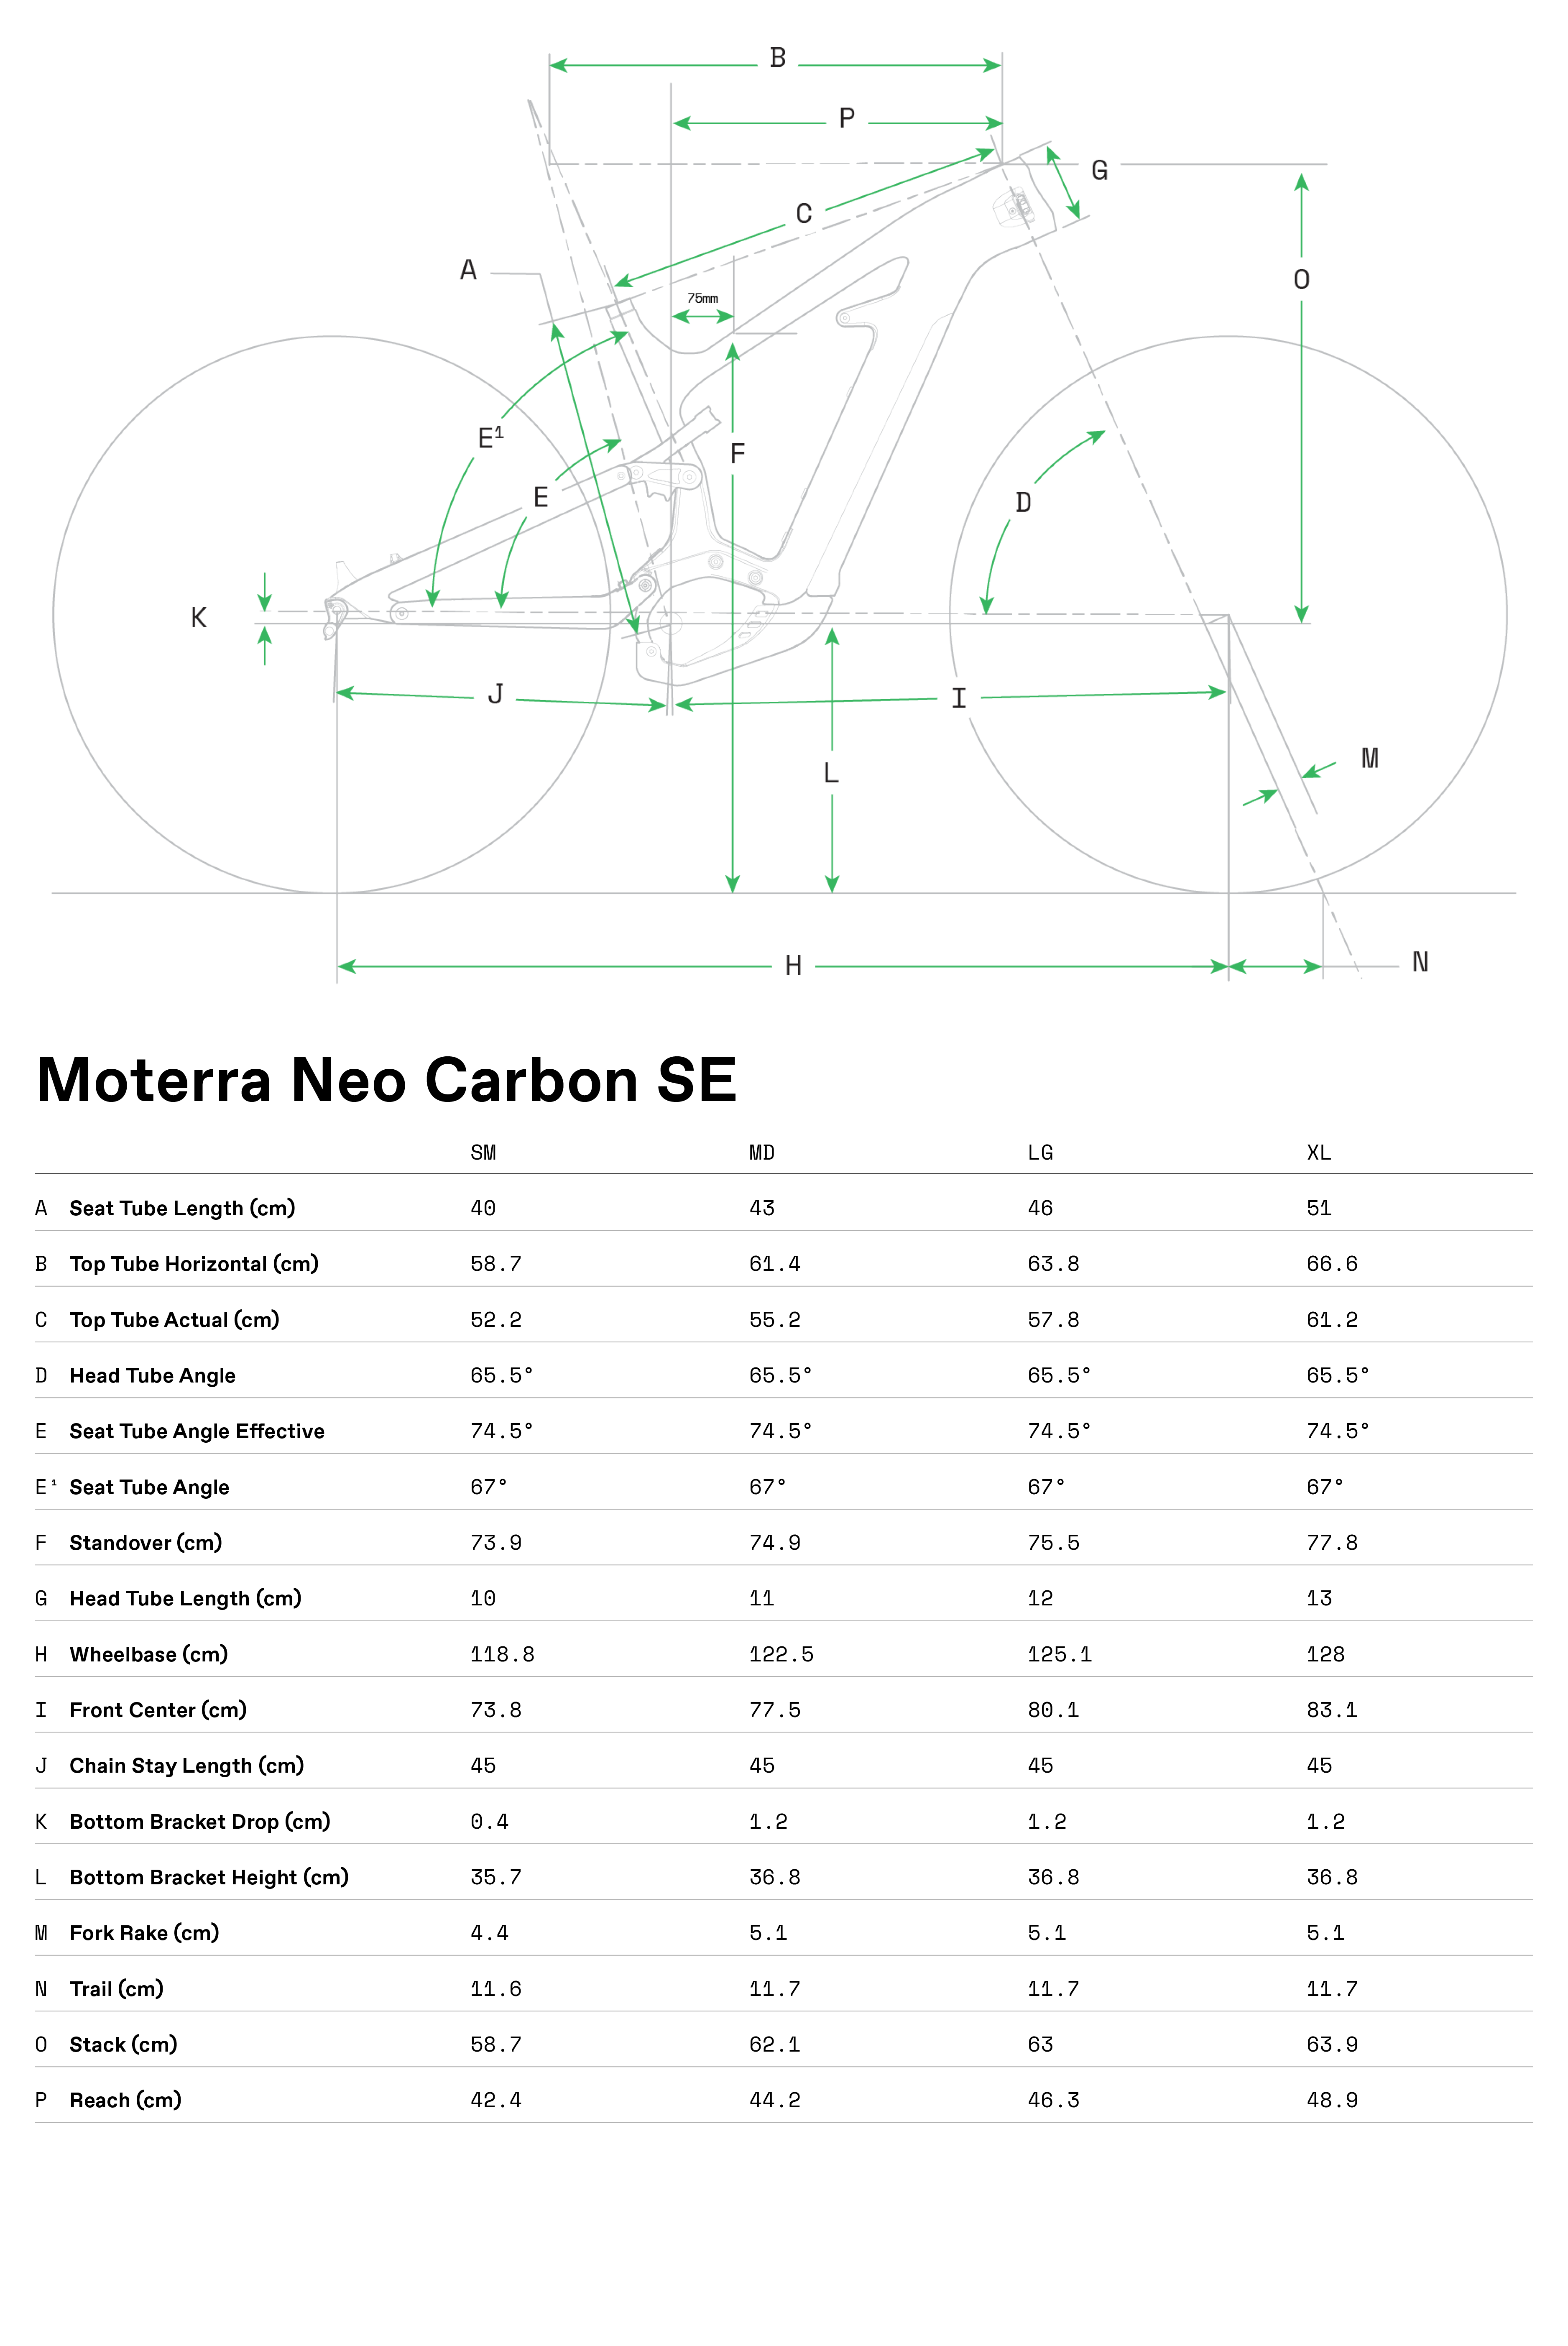 Moterra Neo Carbon SE